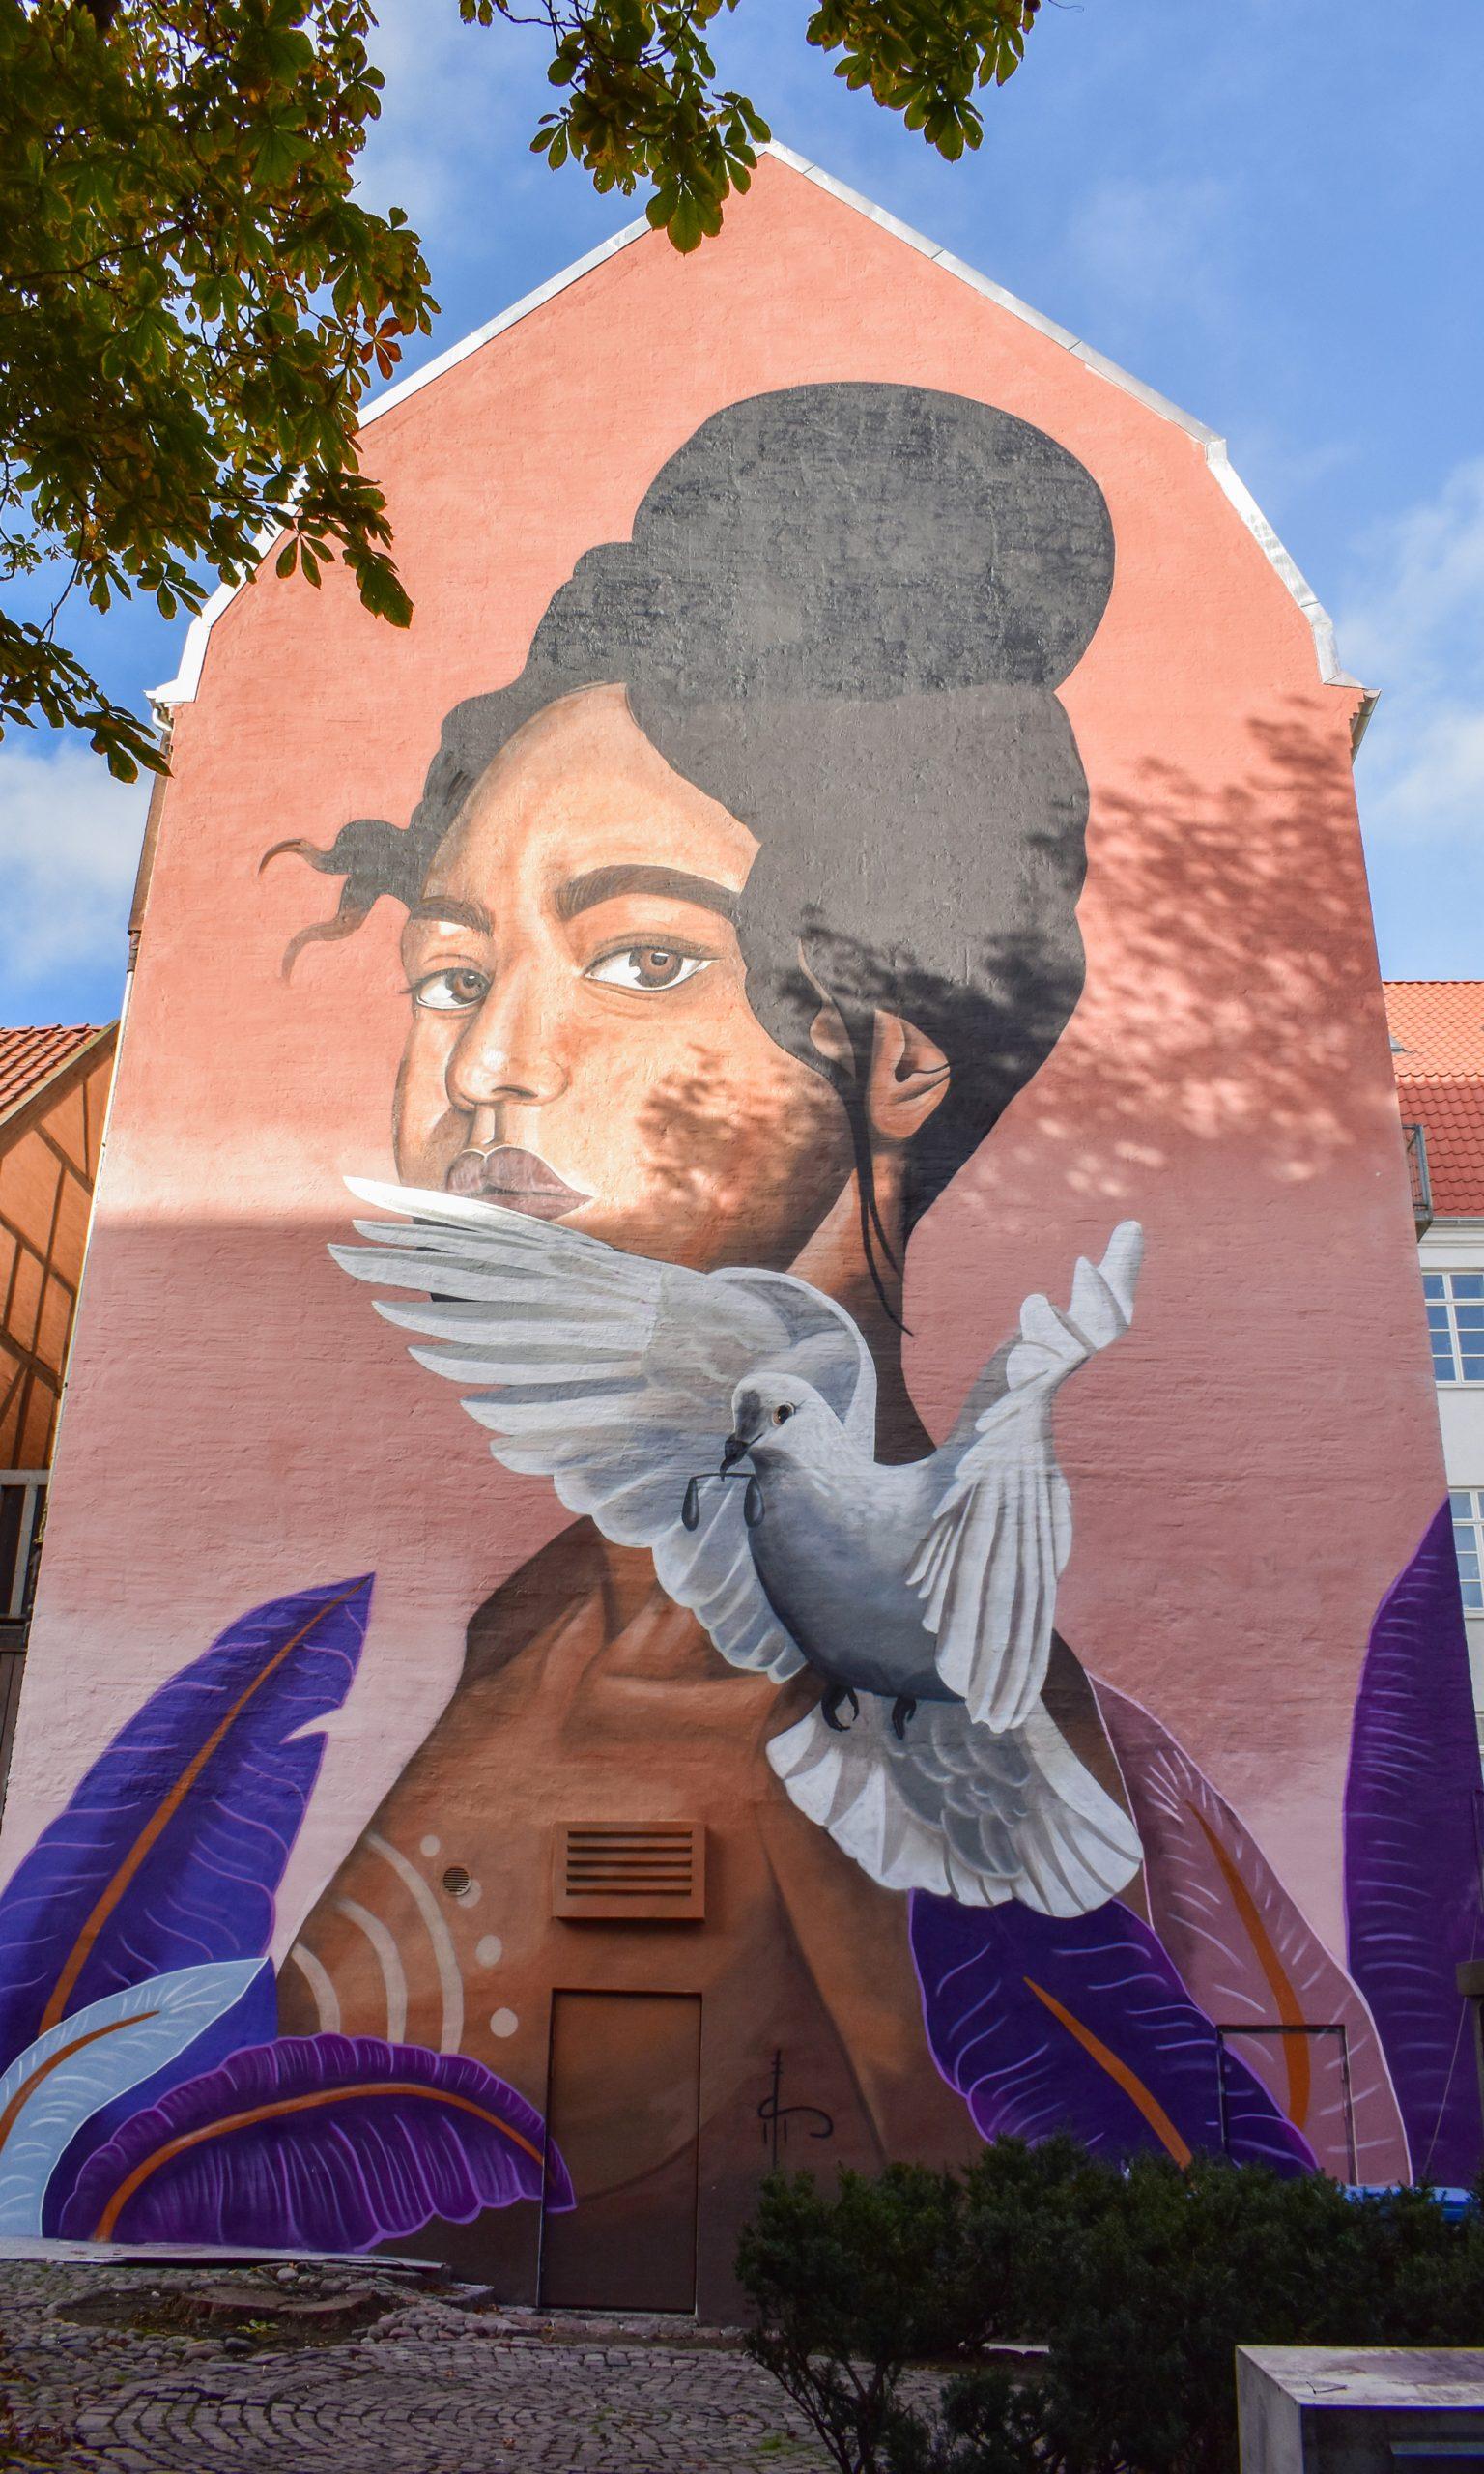 Endnu mere Street Art: Lokal kunstner laver kæmpe gavlmaleri i Aalborg